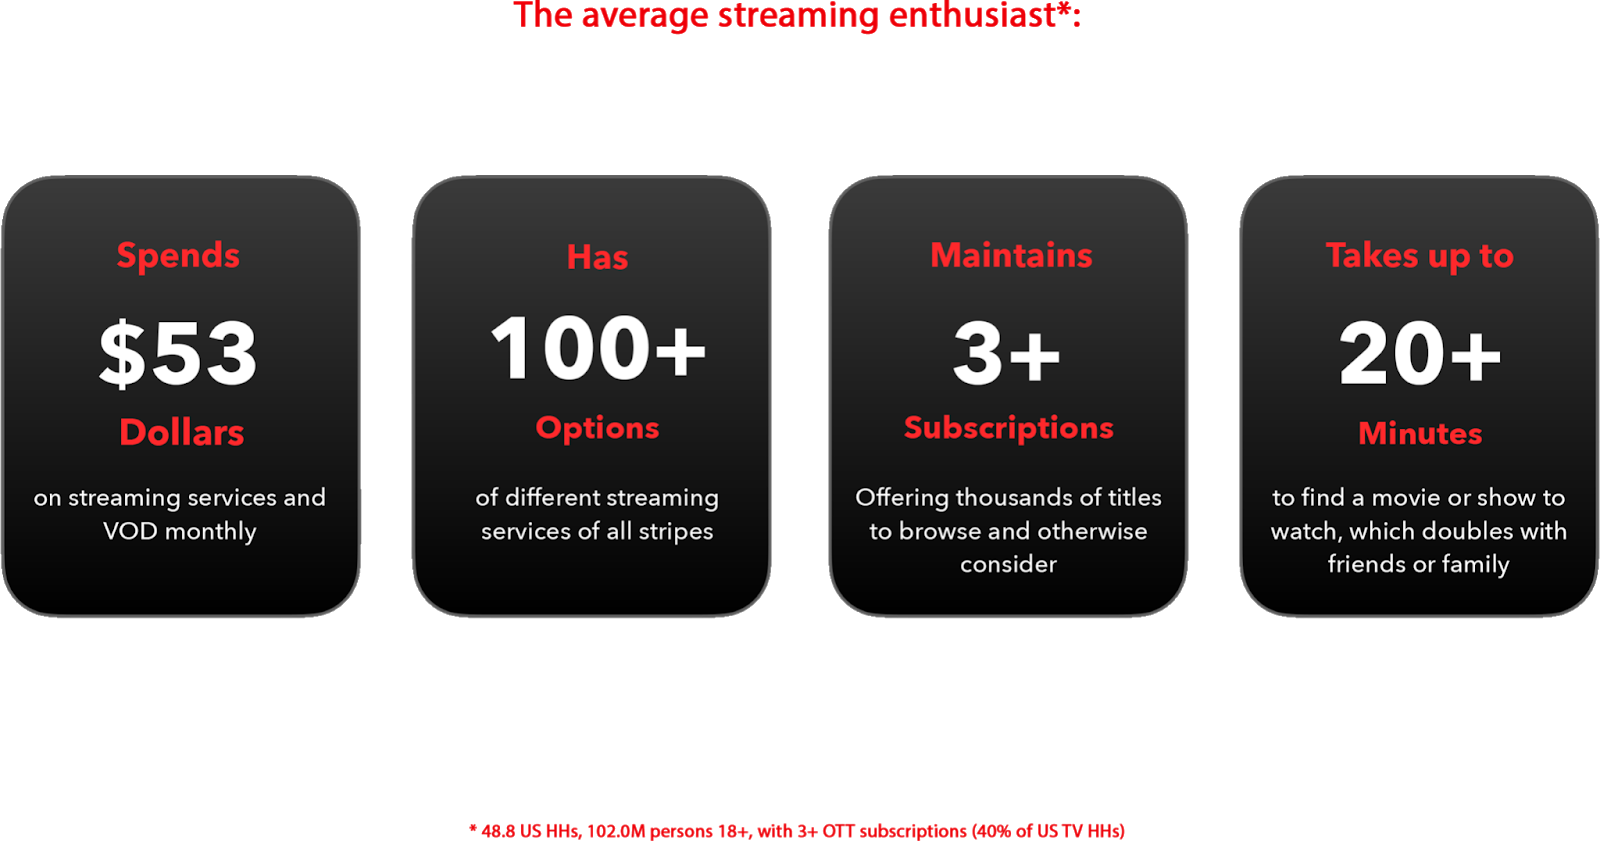 Statistic on Online Media Streaming